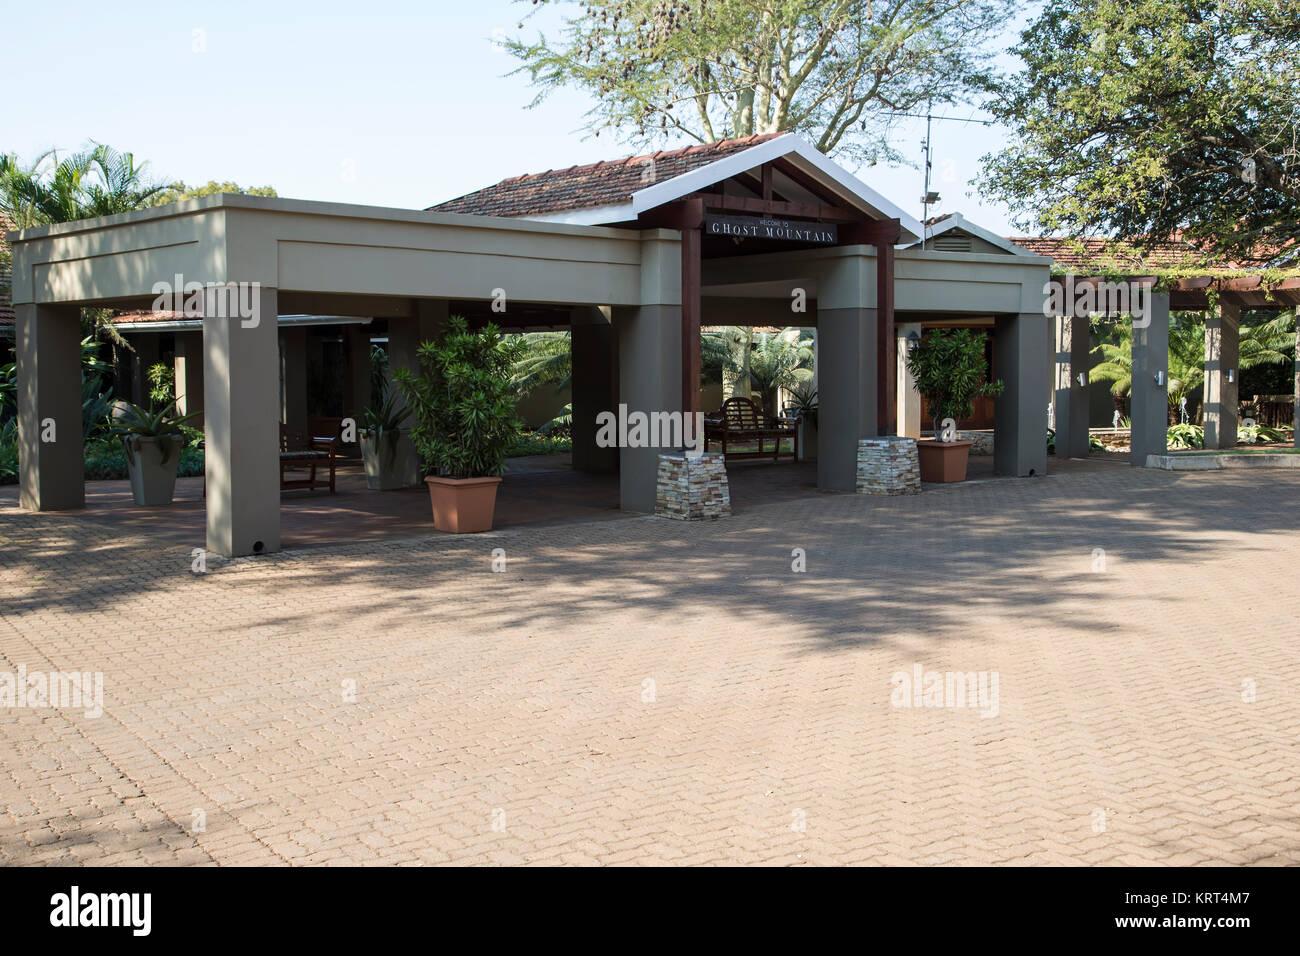 Eingang zum Ghost Mountain Inn in Mkuze, Südafrika Stockbild